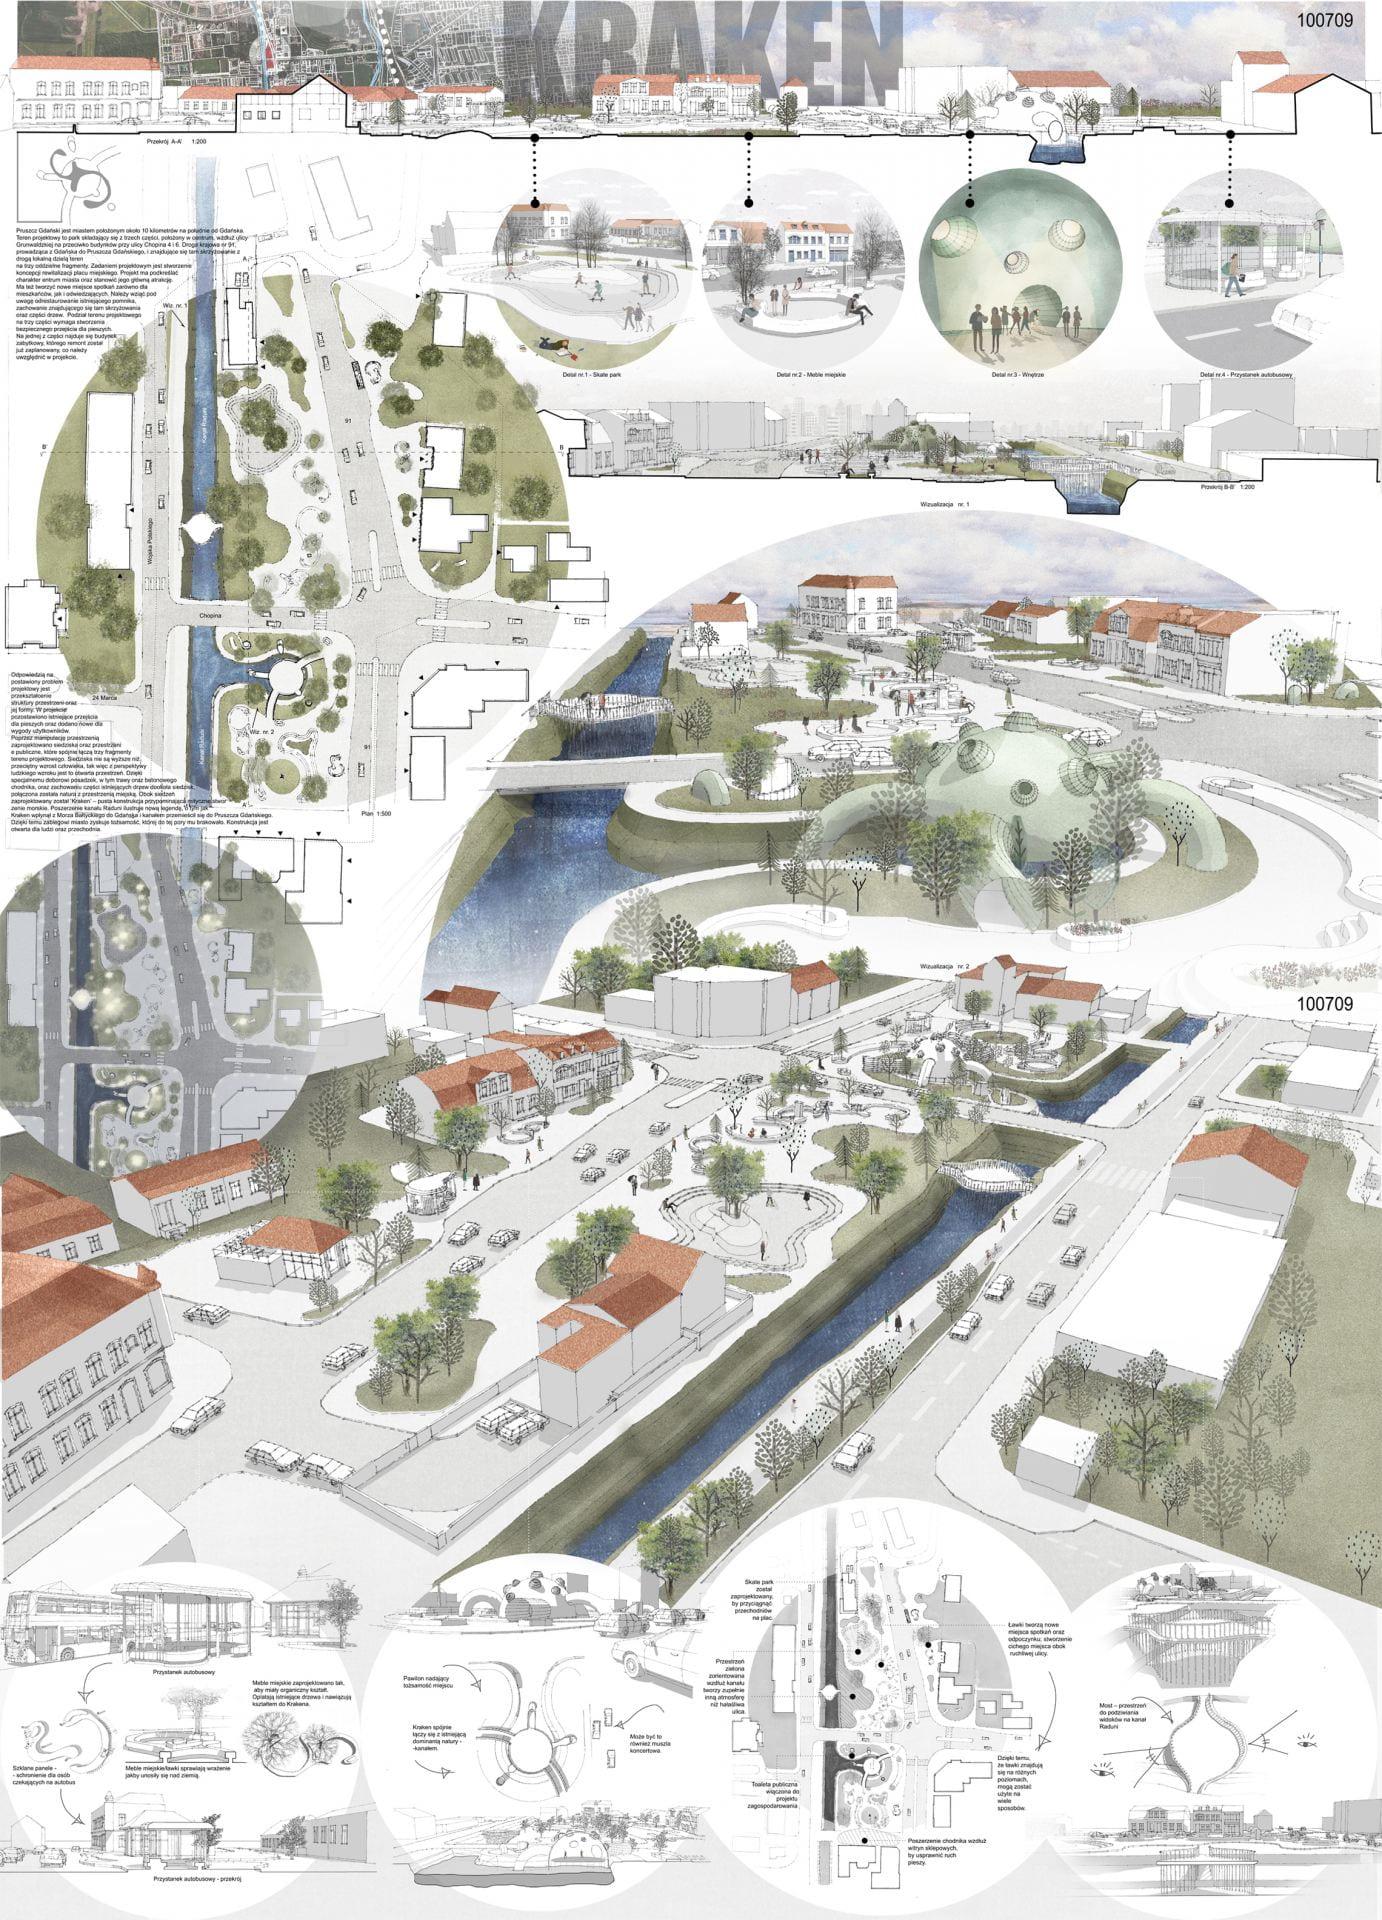 Graphic of award-winning Erasmus design studio redesigning a town square in Poland.